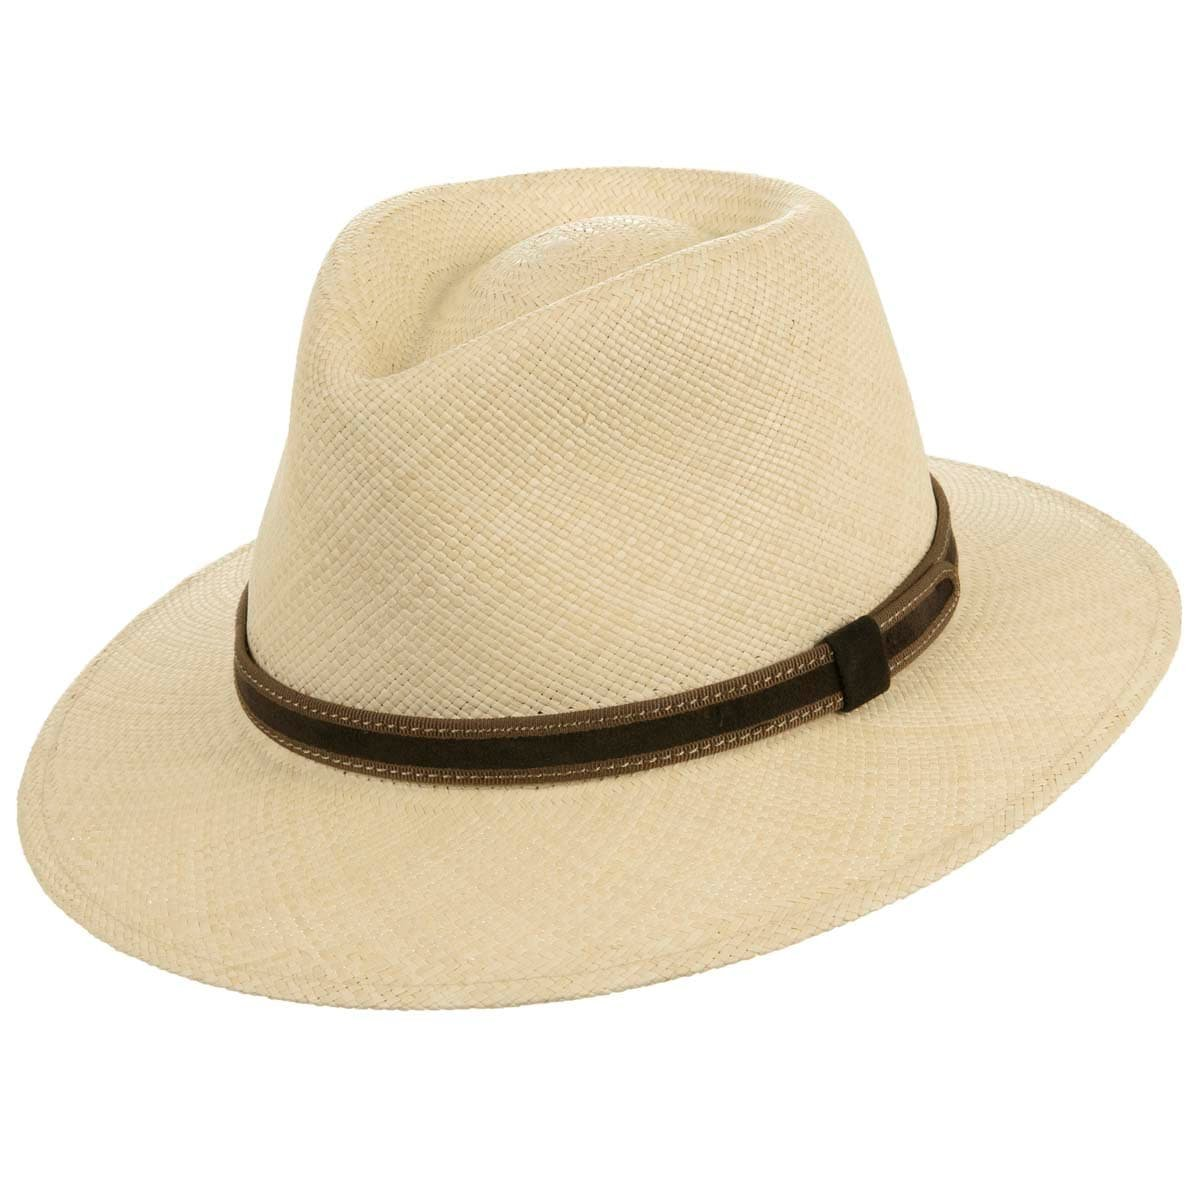 afa838ec Panama straw hat by Hutter